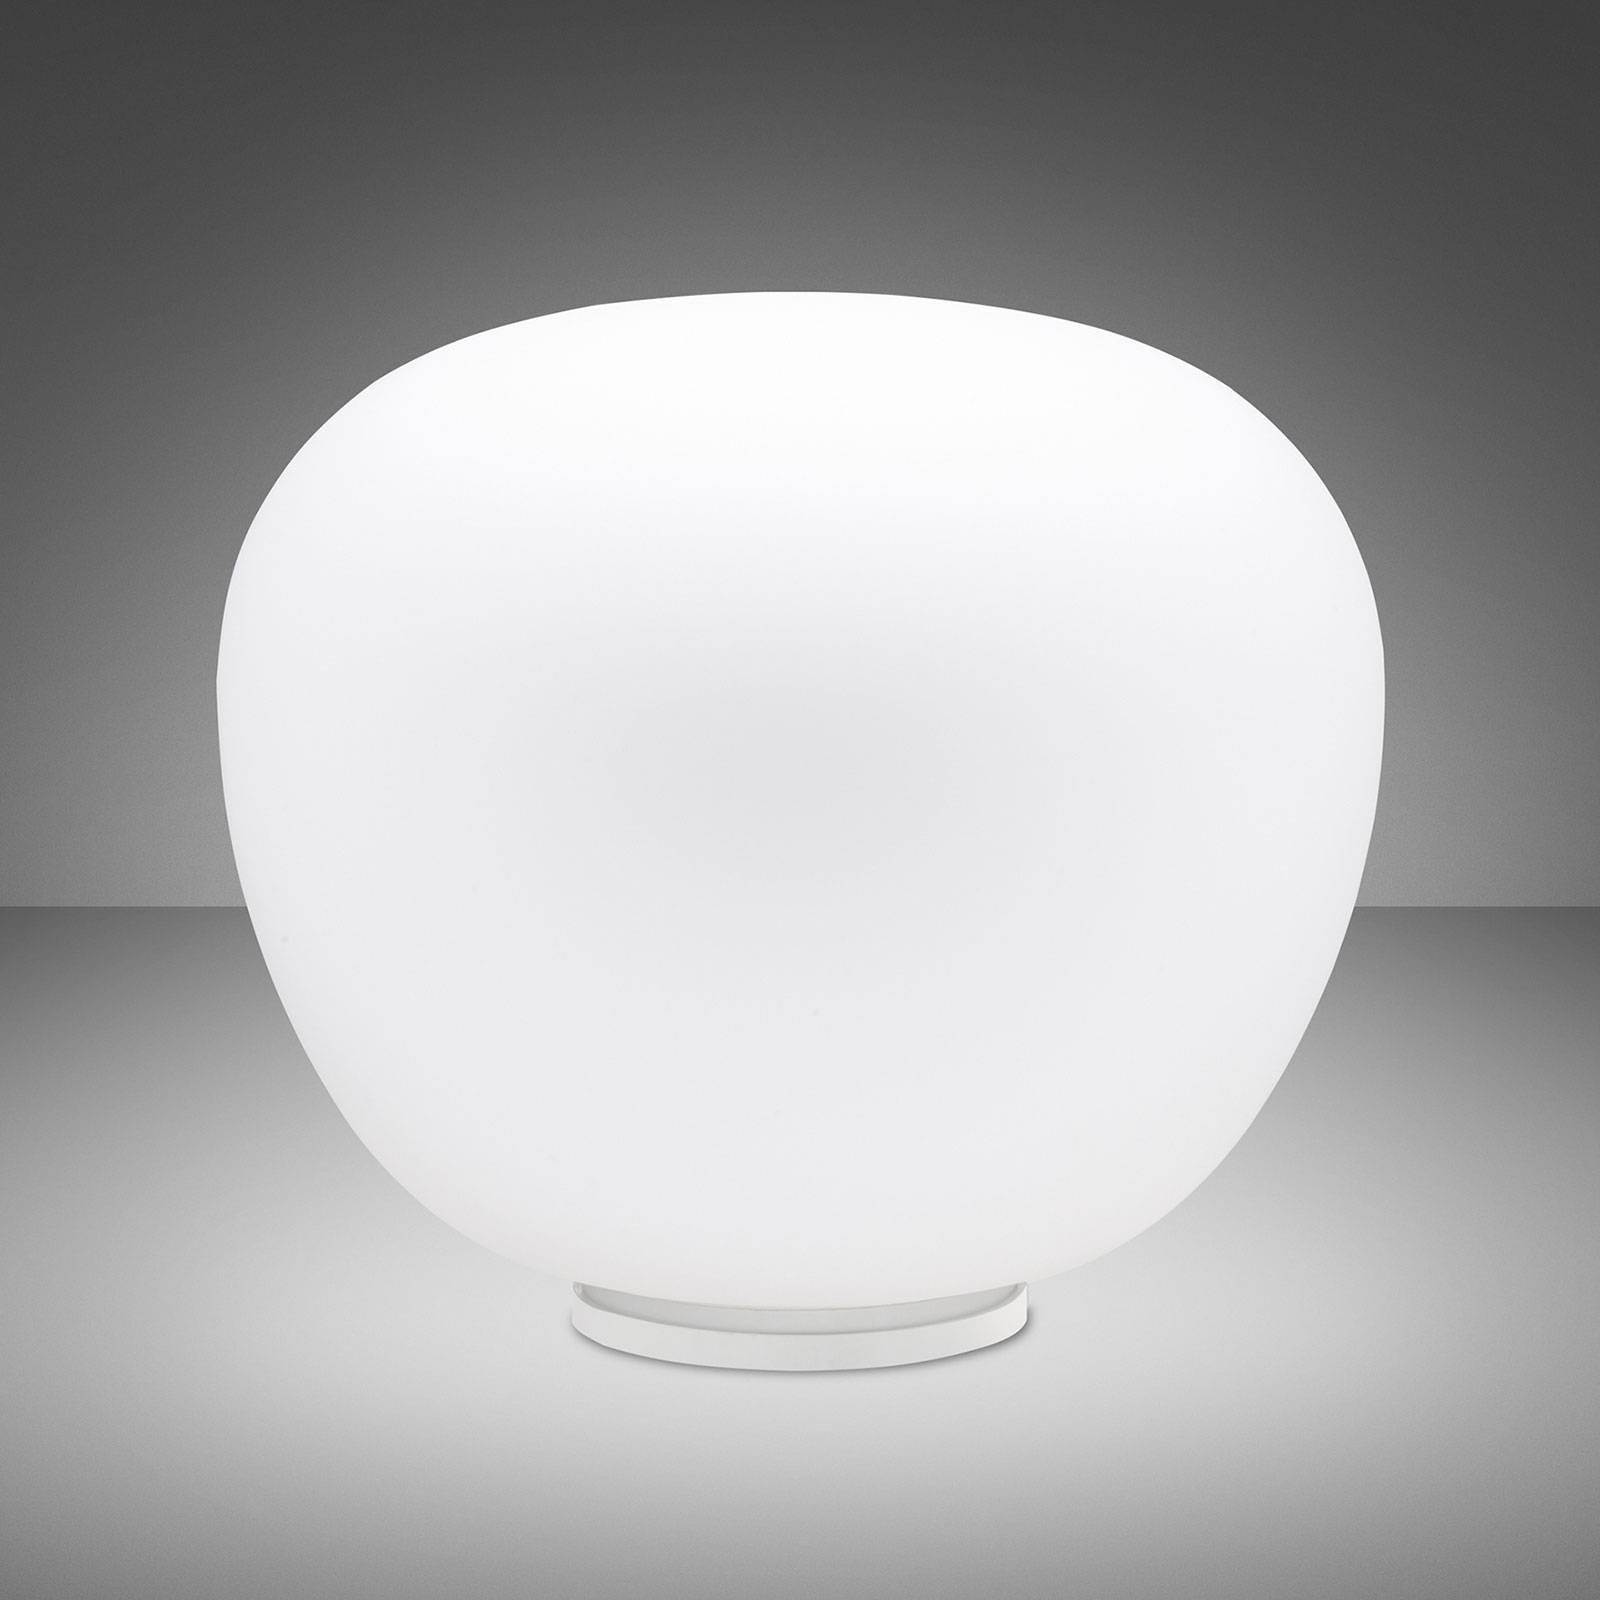 Fabbian Lumi Mochi tafellamp, liggend, Ø 45 cm